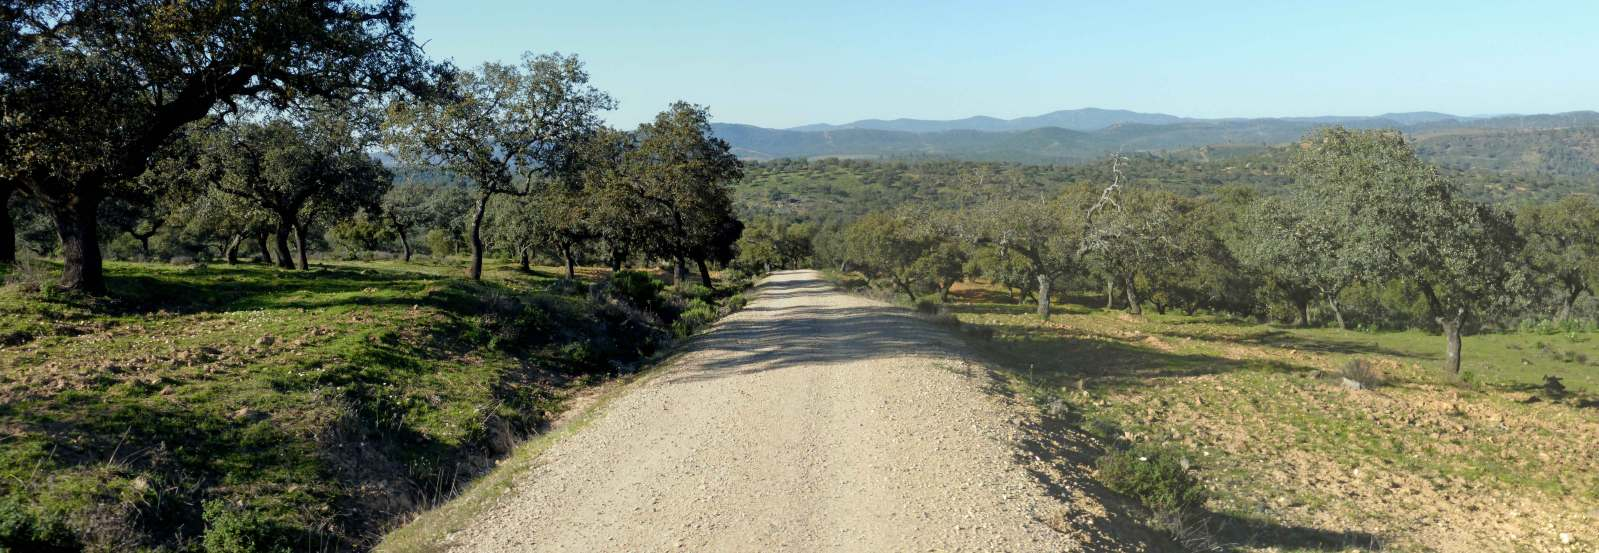 Vía de la Plata-Camino Sanabrés (Sevilla-Santiago). Eqovuh